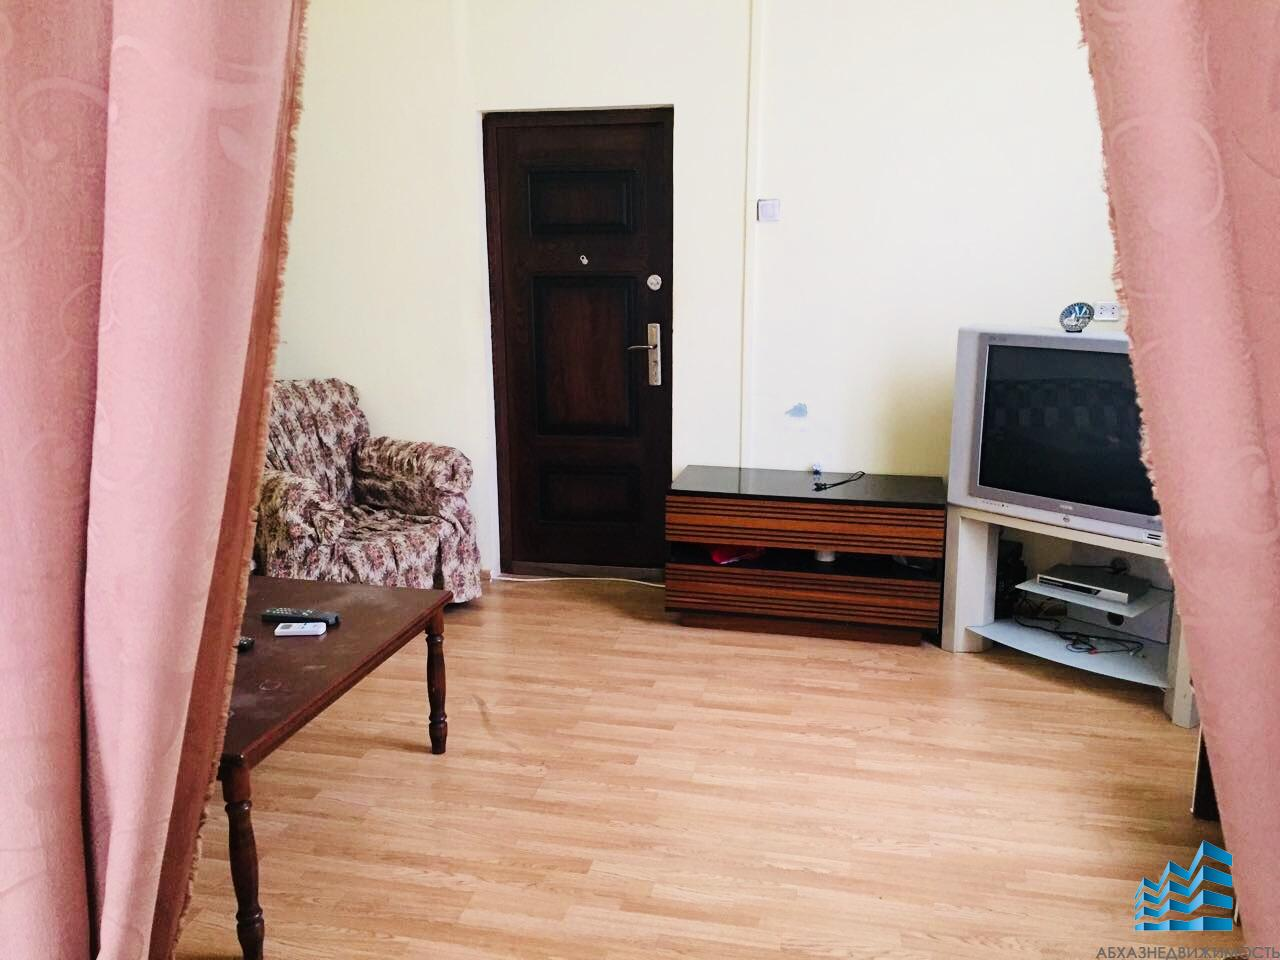 2-комнатная квартира в аренду за 15 тыс.руб